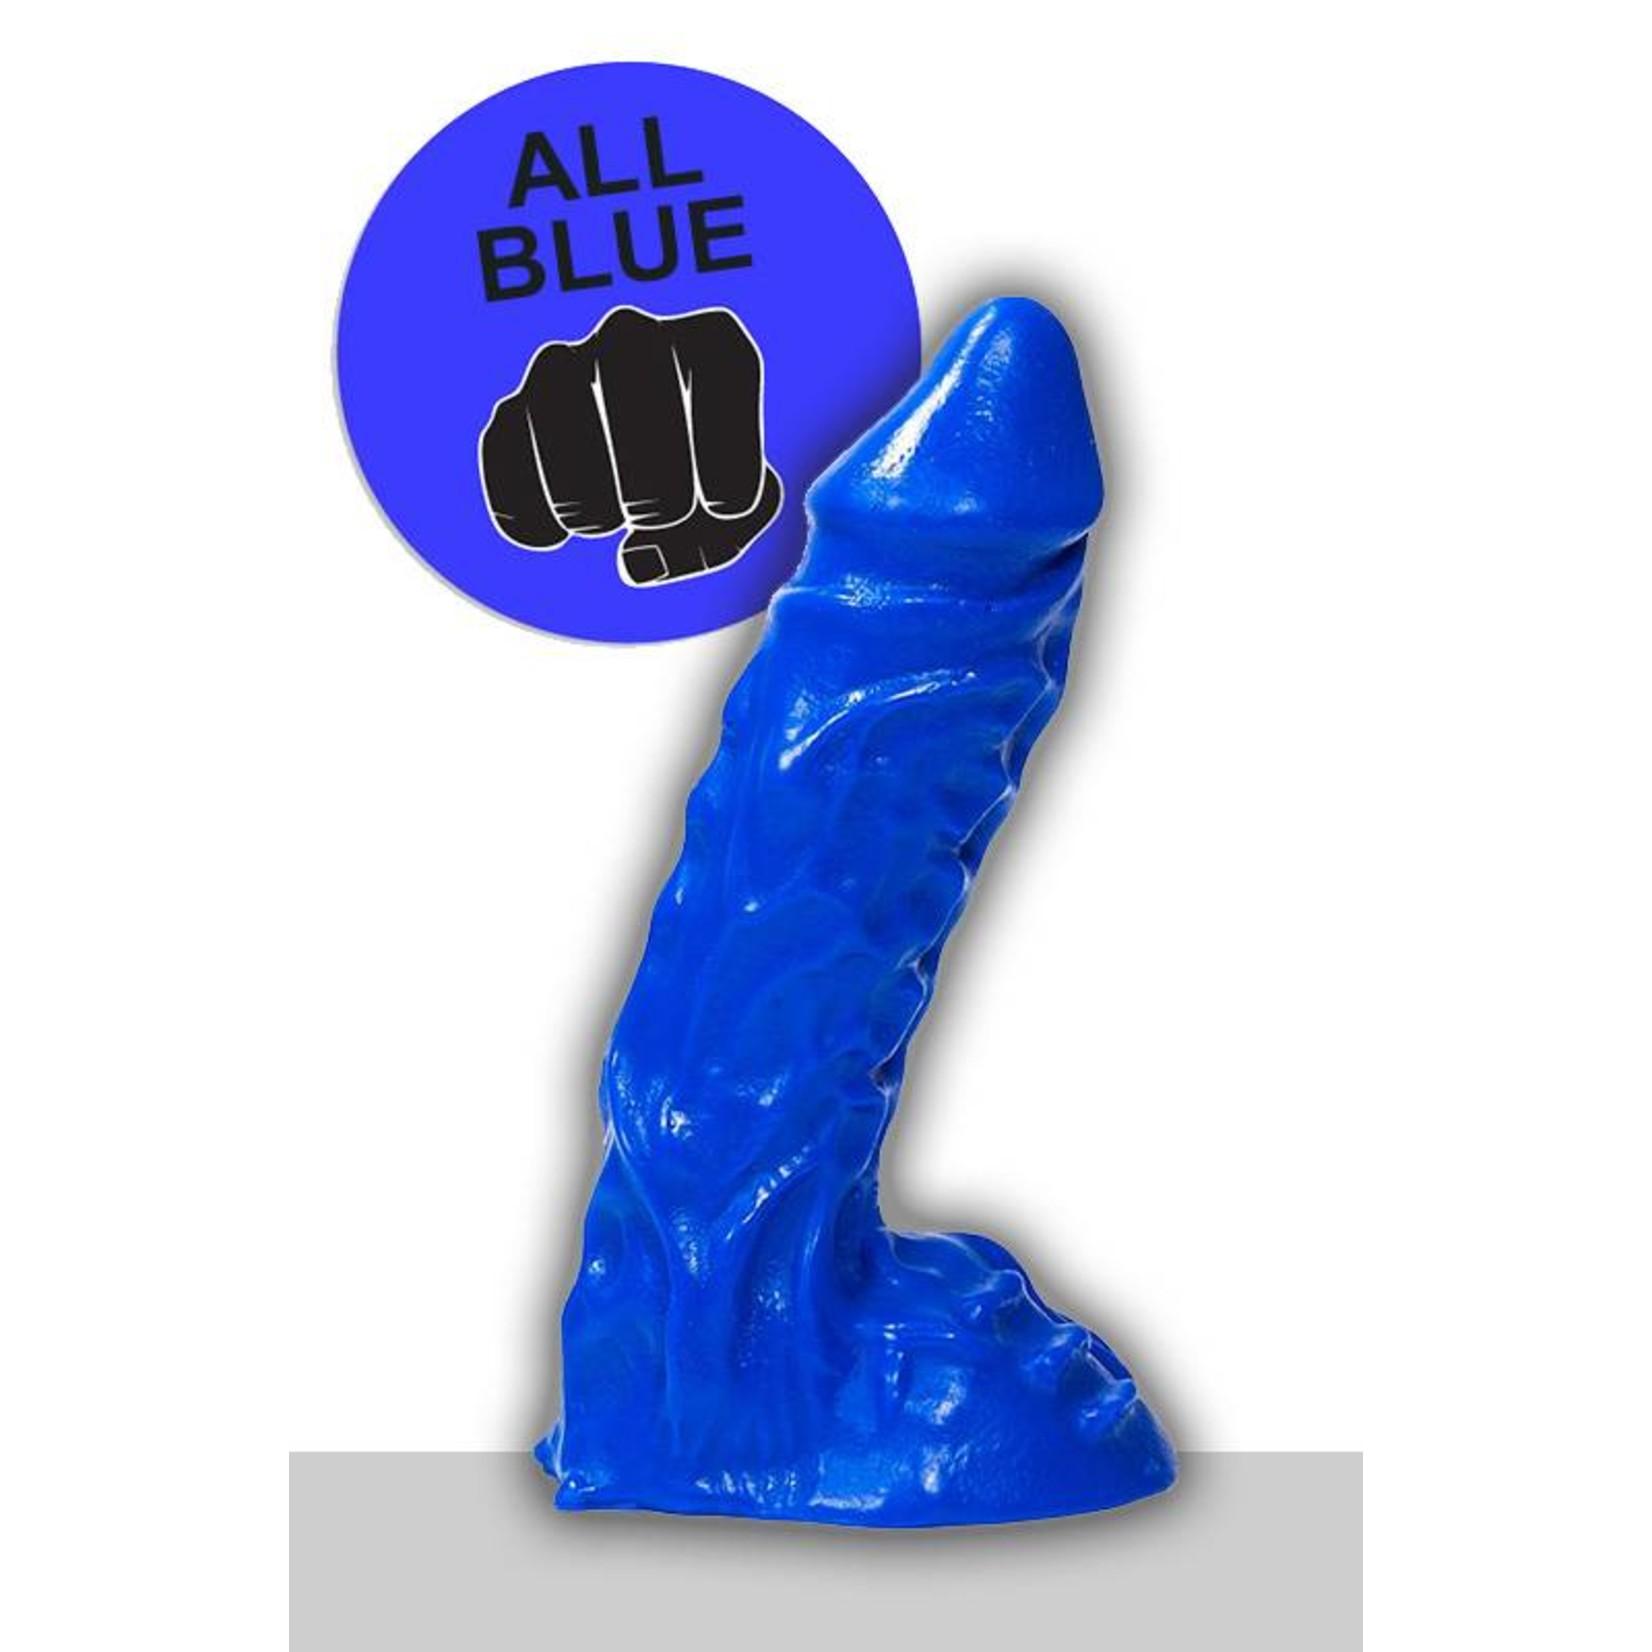 All Black All Blue Dildo - ABB 27